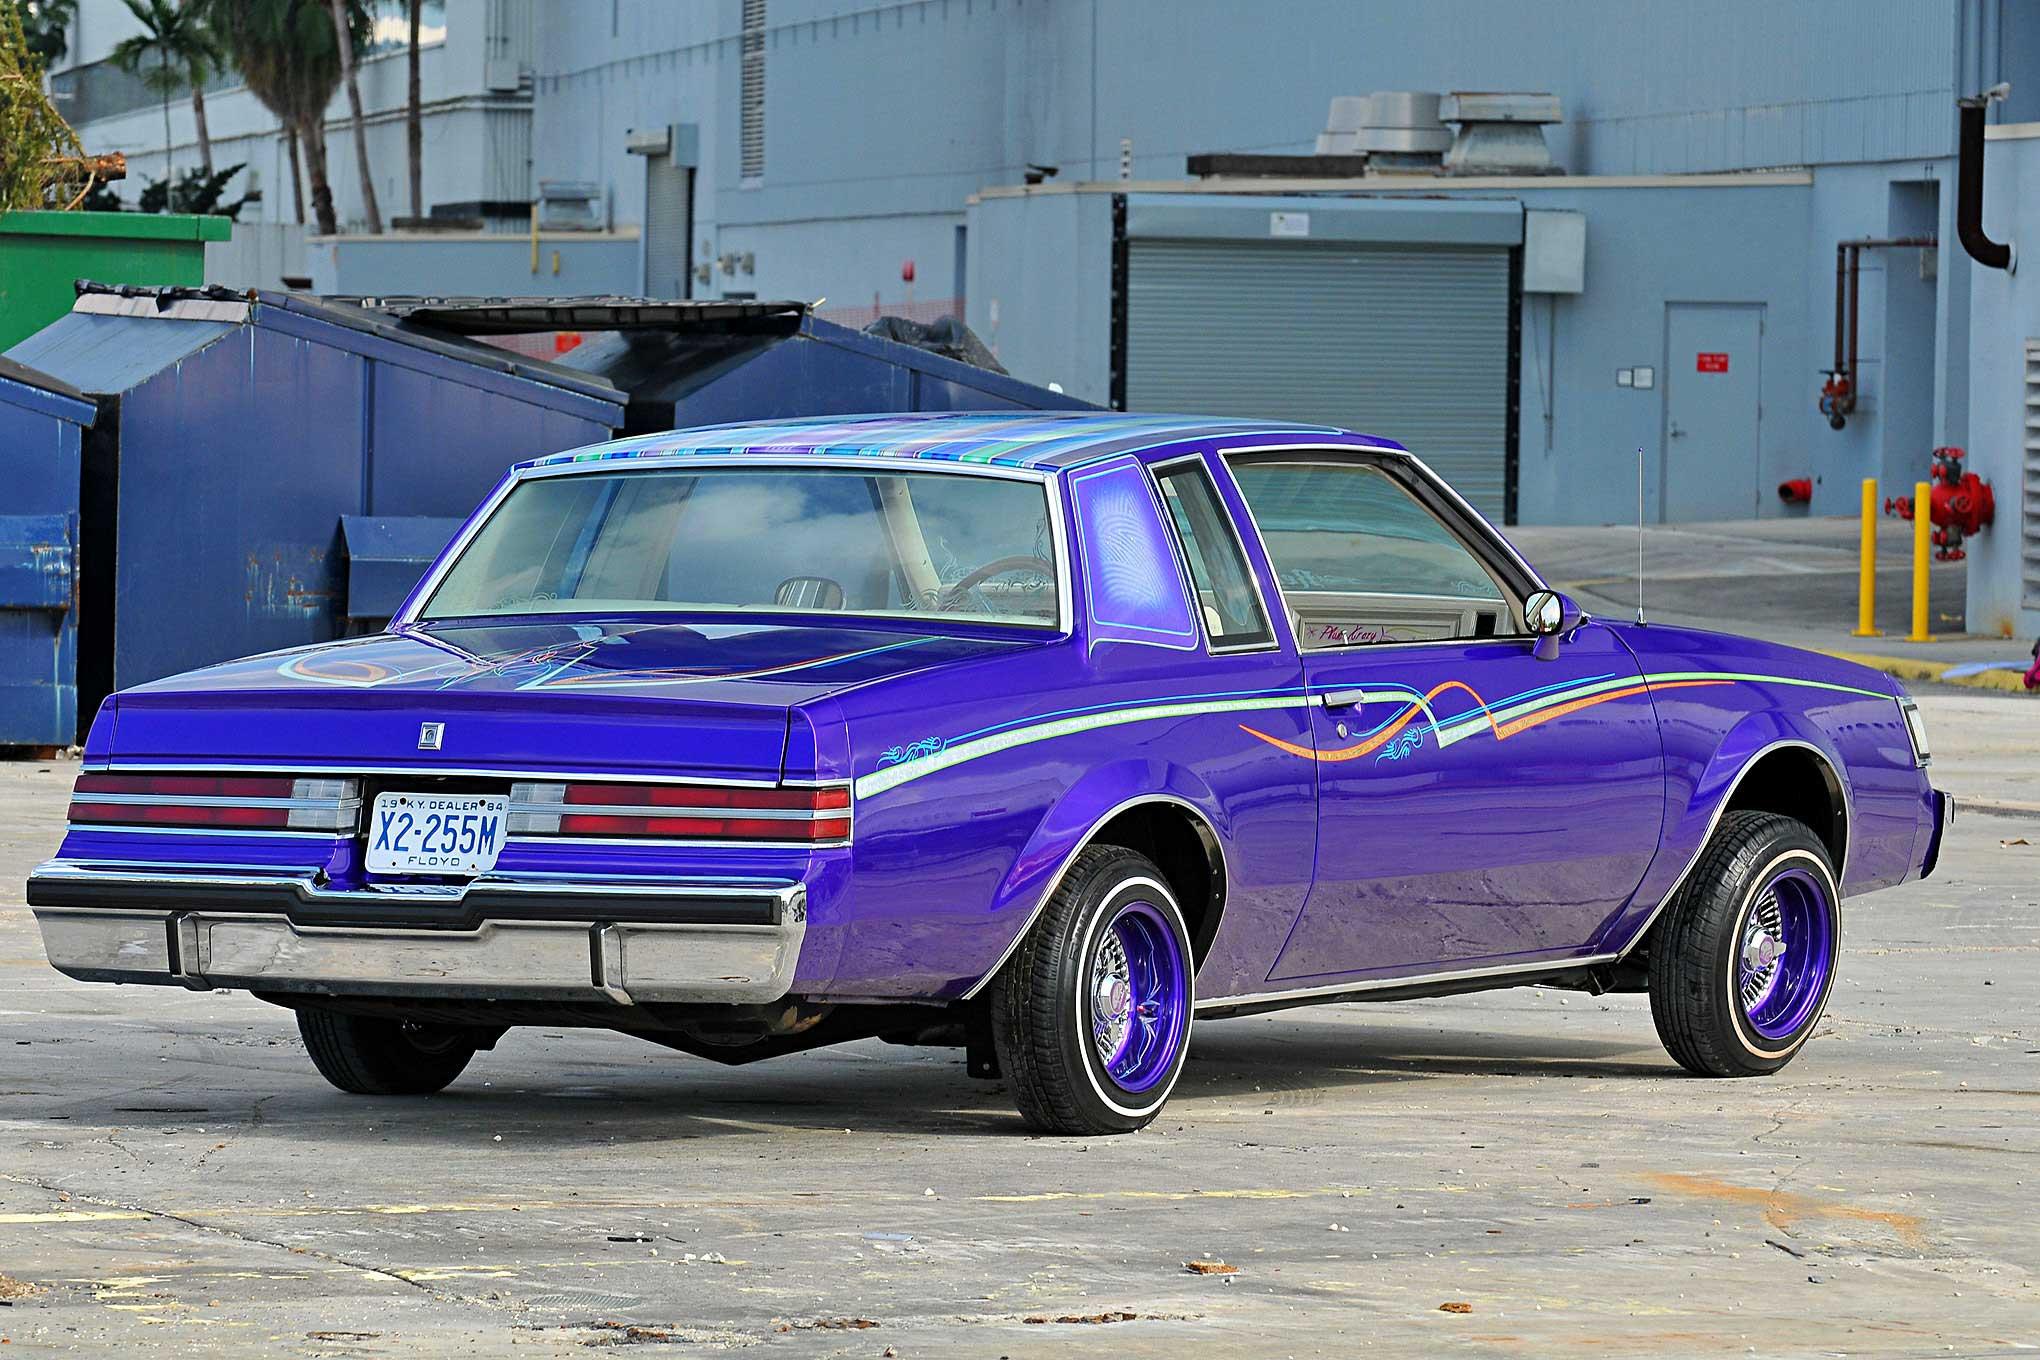 1983 Buick Regal - A Regal Time